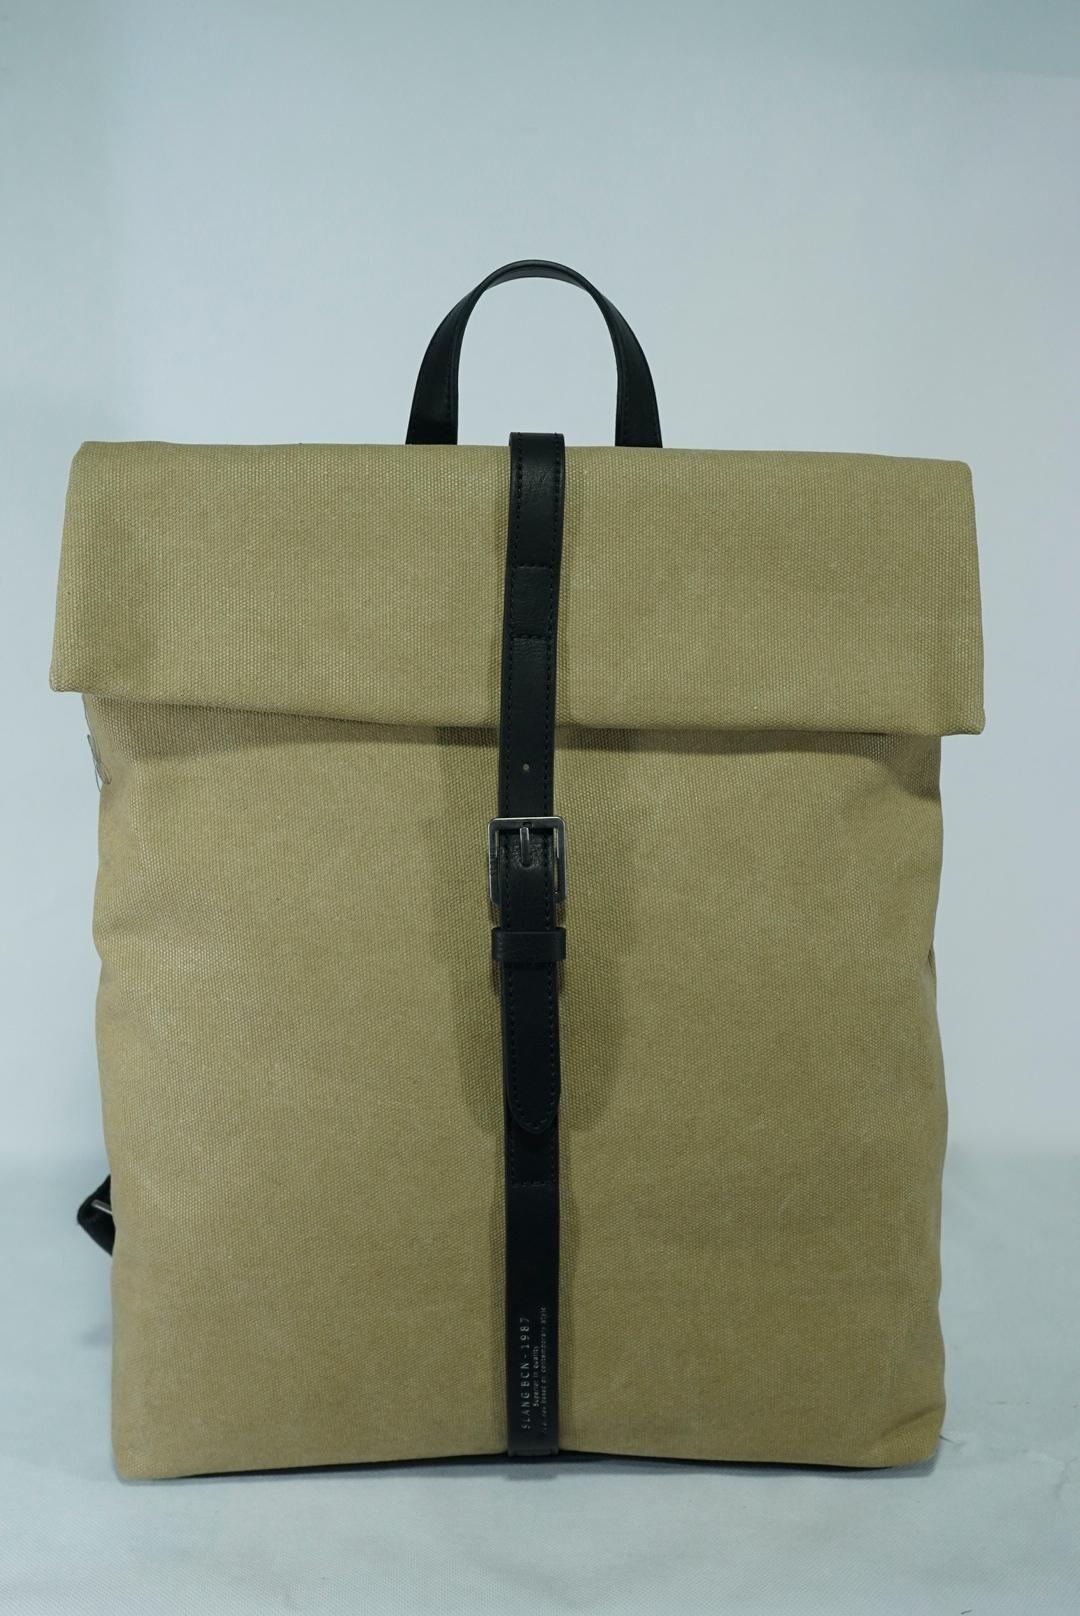 23f755606 Comprar Bolso Mochila Slang SMART amarillo SM1 15 online | Slang 18 ...